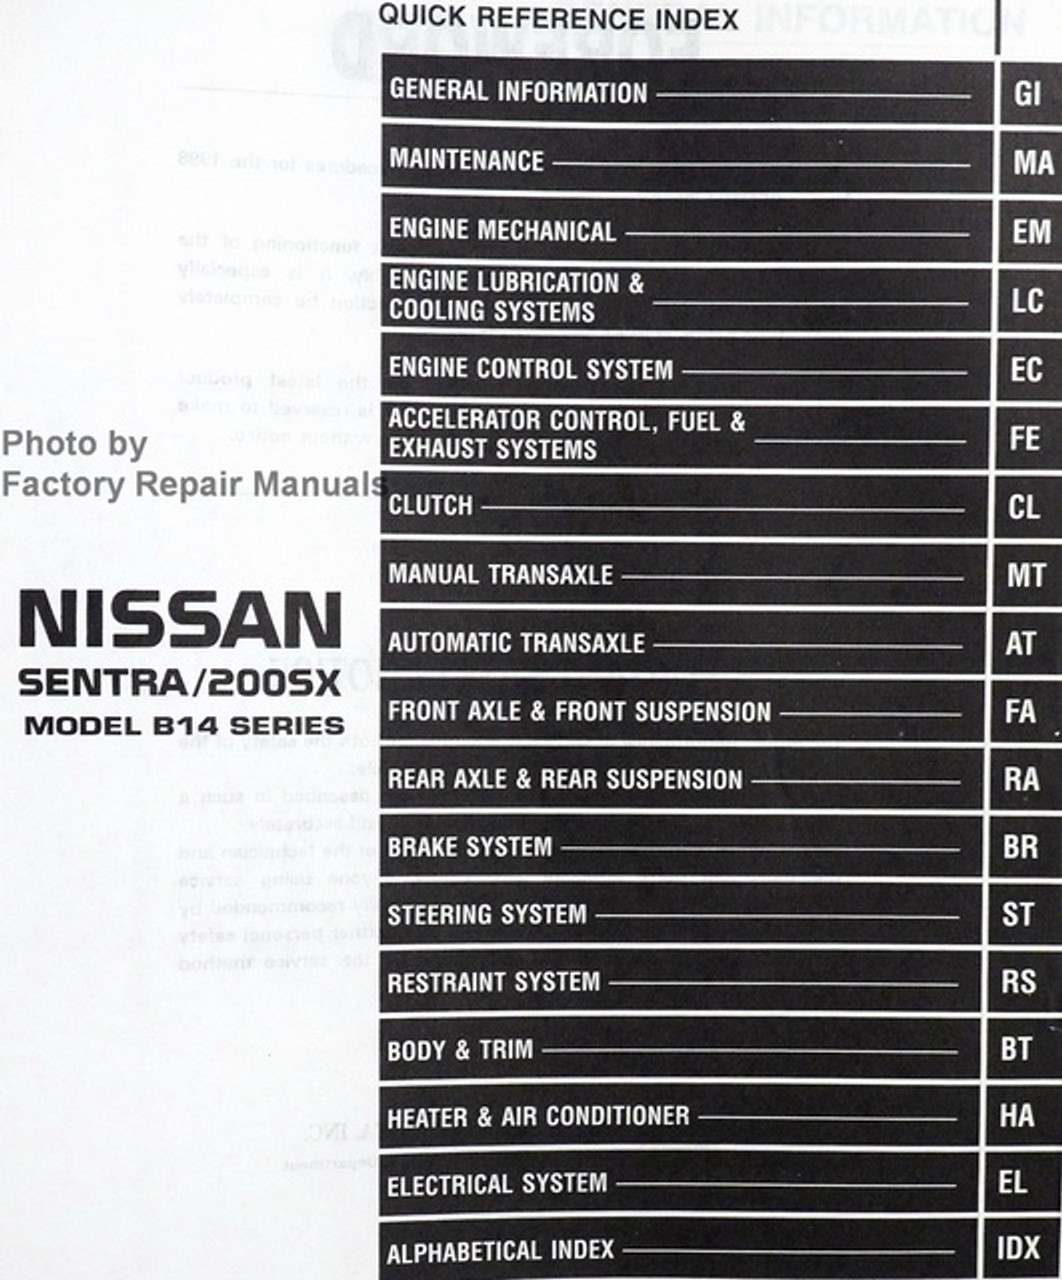 1998 Nissan Sentra 1.6L, 200SX 1.6L Factory Service Manual Original Shop  Repair - Factory Repair Manuals | 1998 Nissan Sentra Air Conditioner Wiring Diagram |  | Factory Repair Manuals